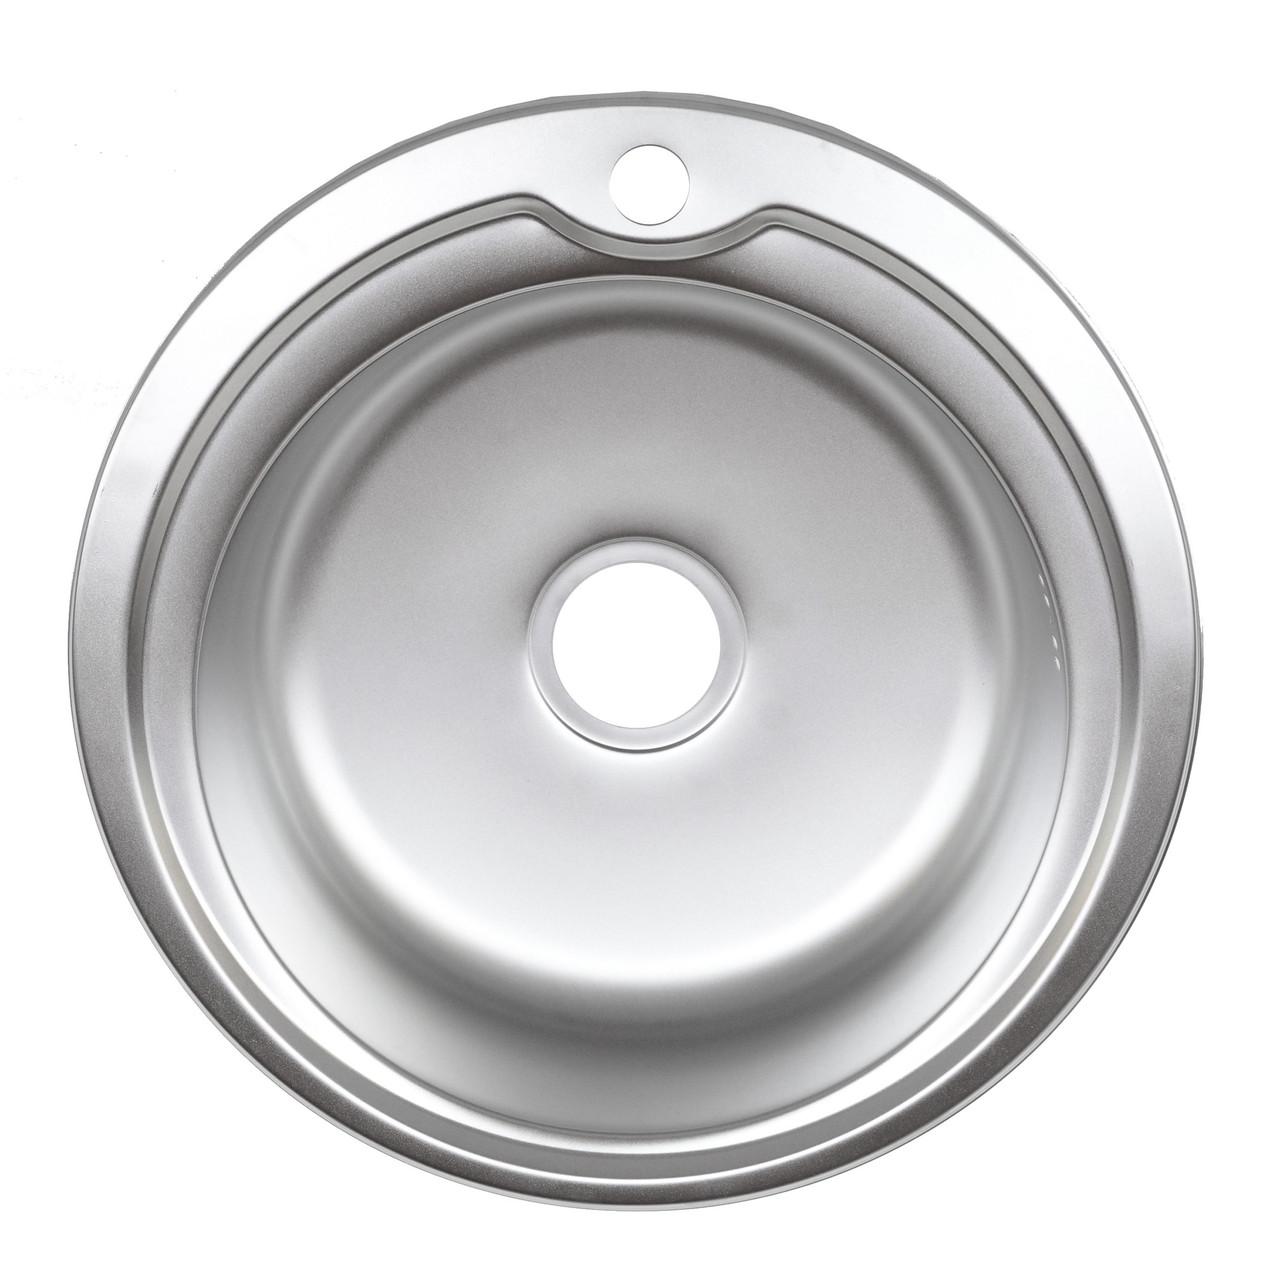 Мойка для кухни Platinum 510 мм круглая 0,6 мм электро-сатин глубина 18 см